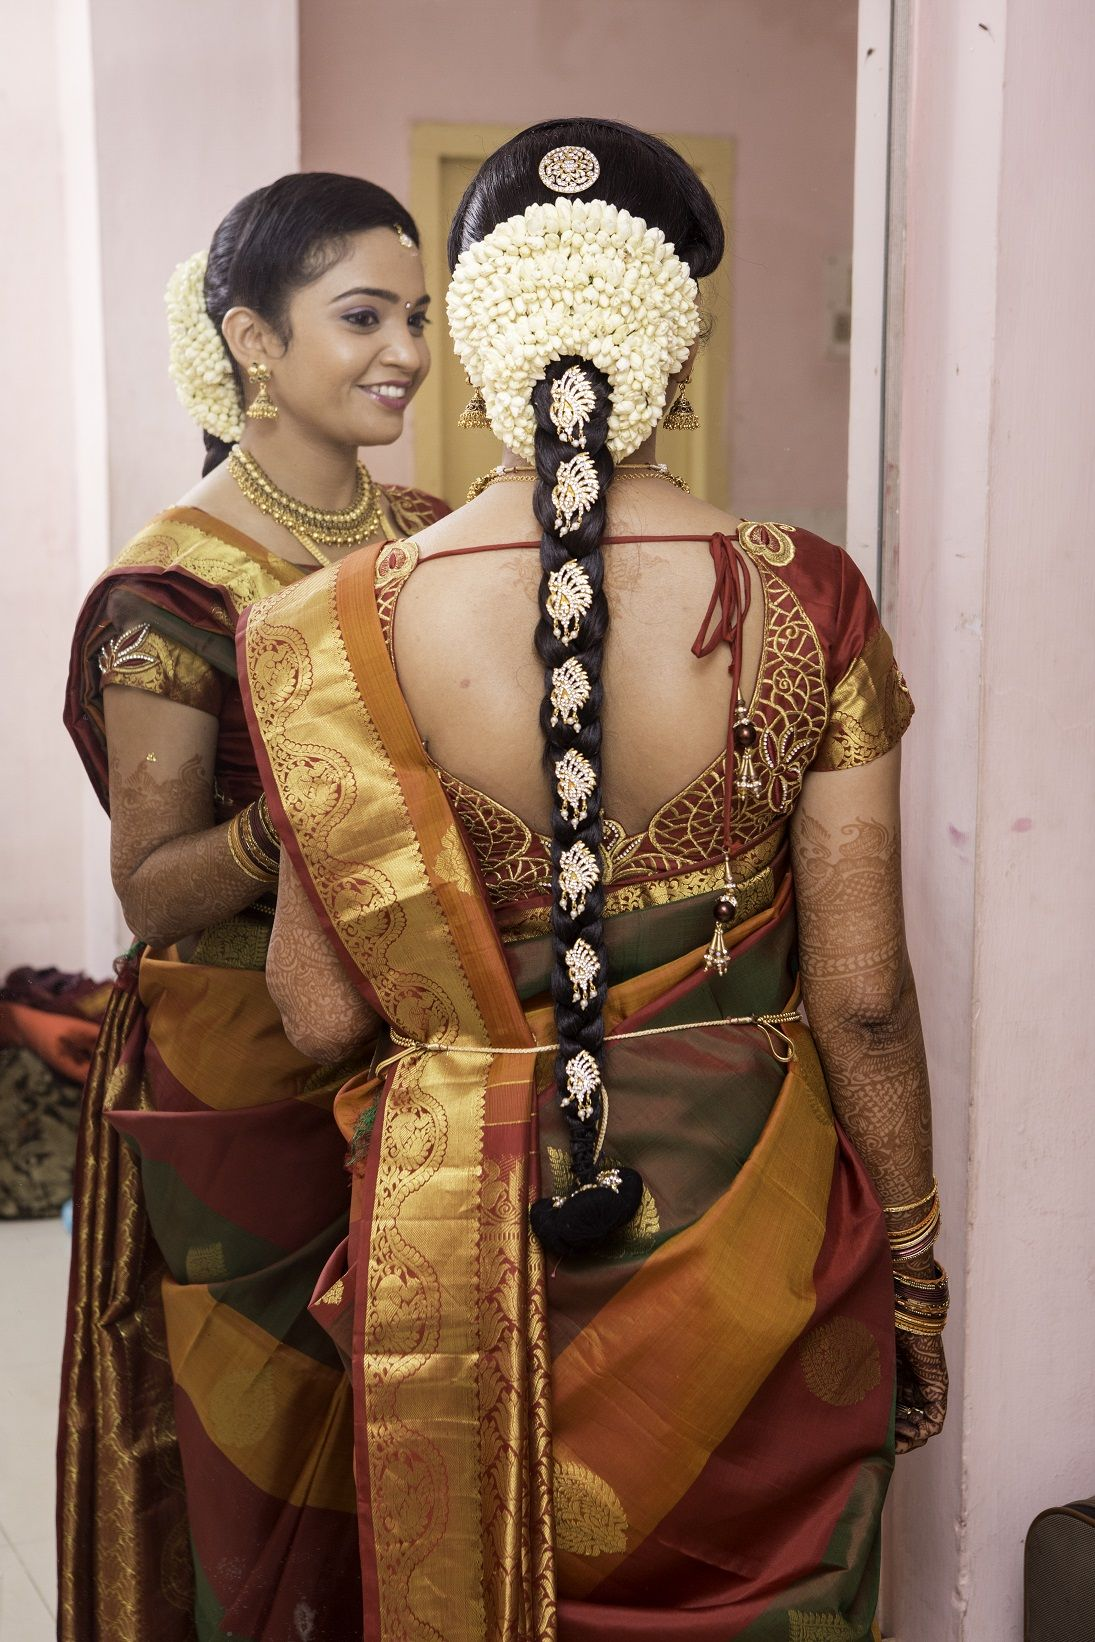 photostrophe #photostrophe #photography #weddingphotography